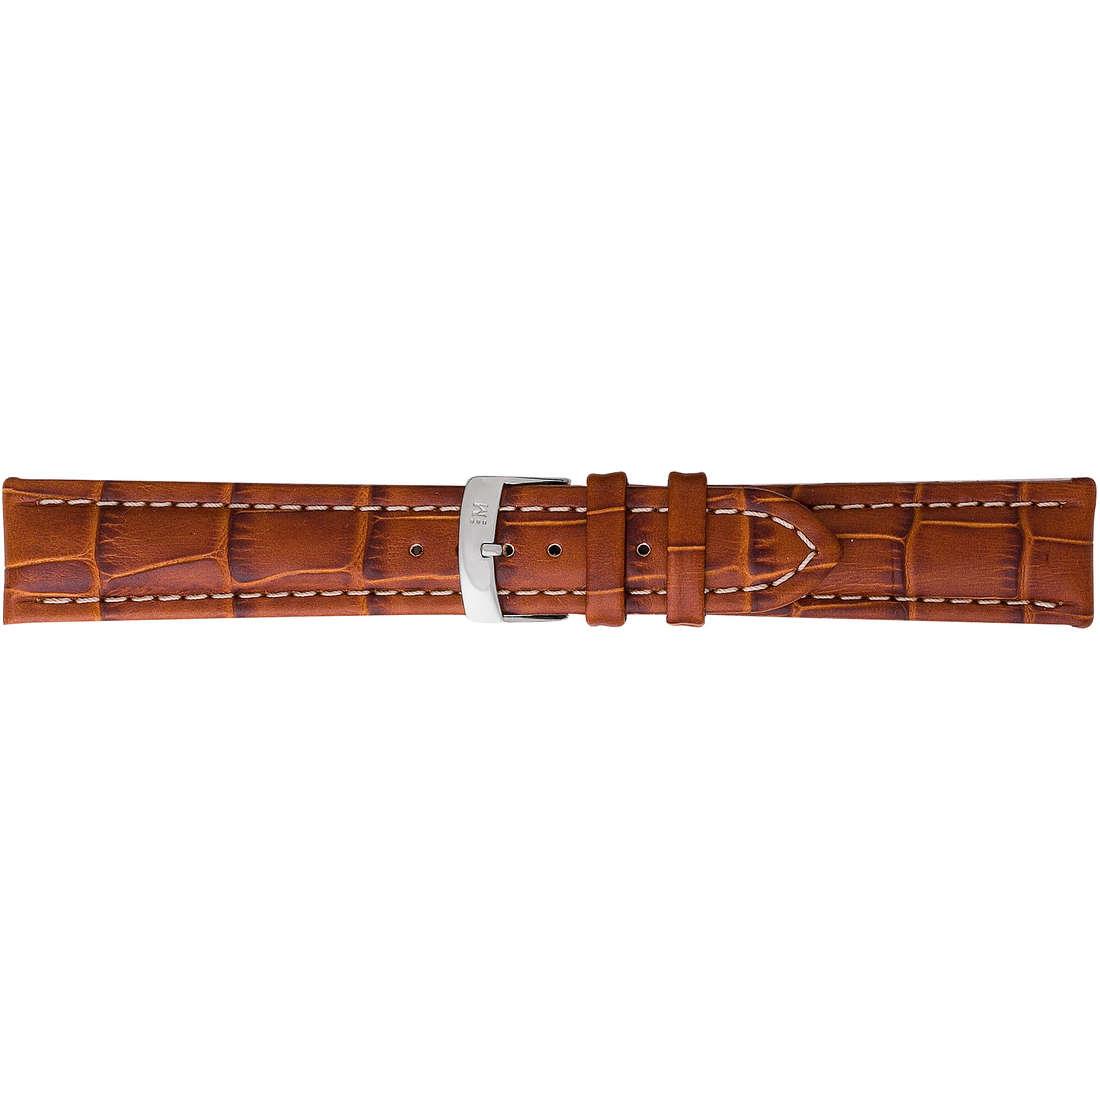 watch watch bands watch straps man Morellato Morellato 1930 A01U3252480041CR20